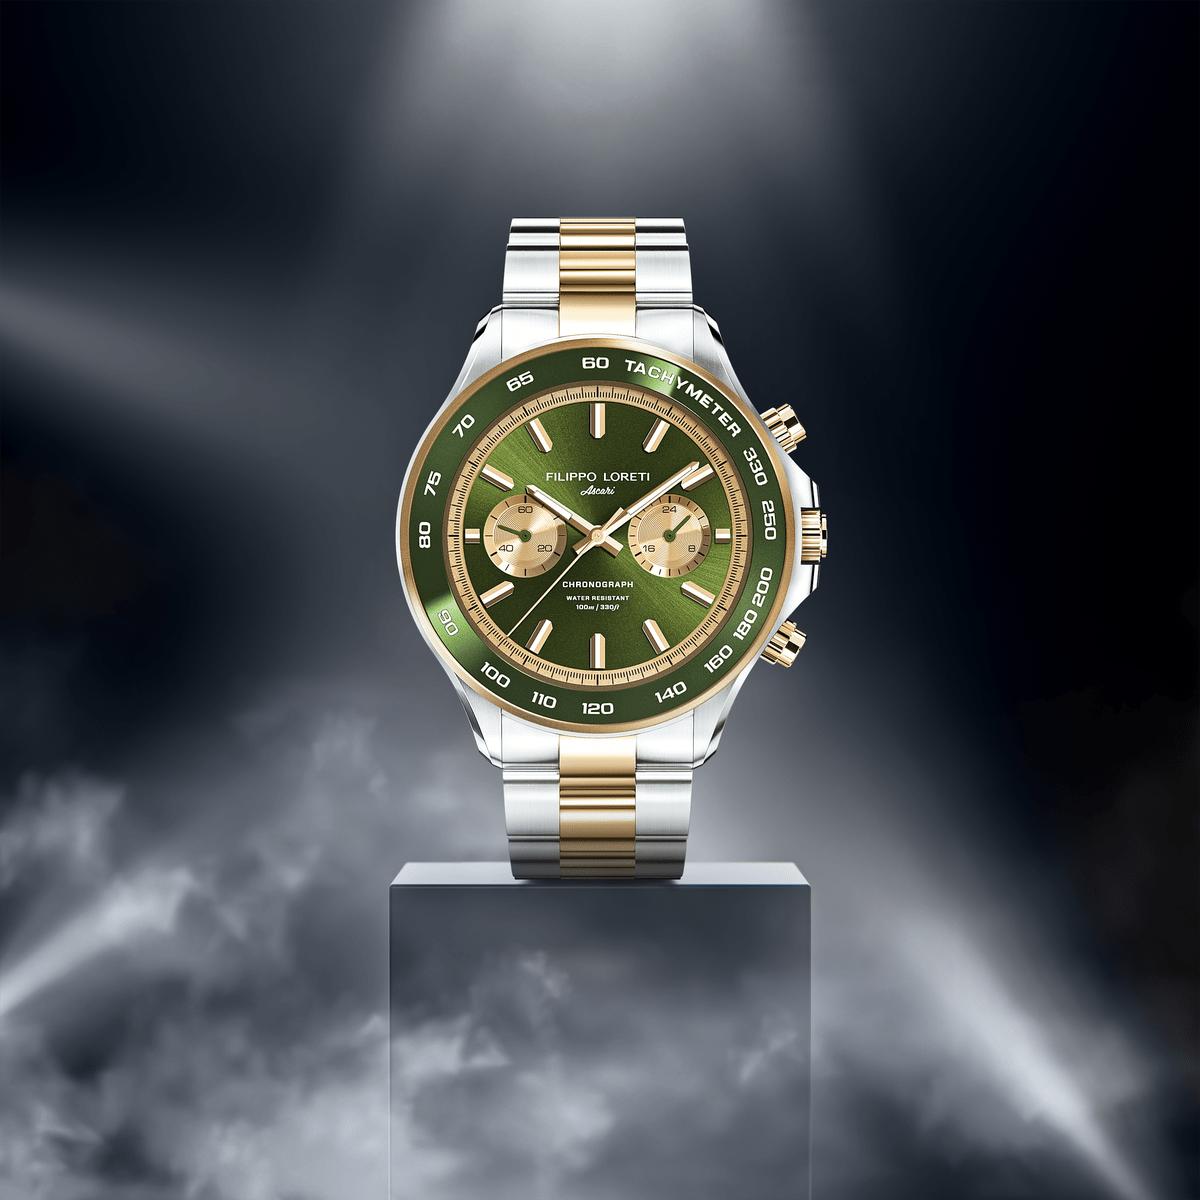 Ascari Two Tone Moss Men's Watch from Filippo Loreti